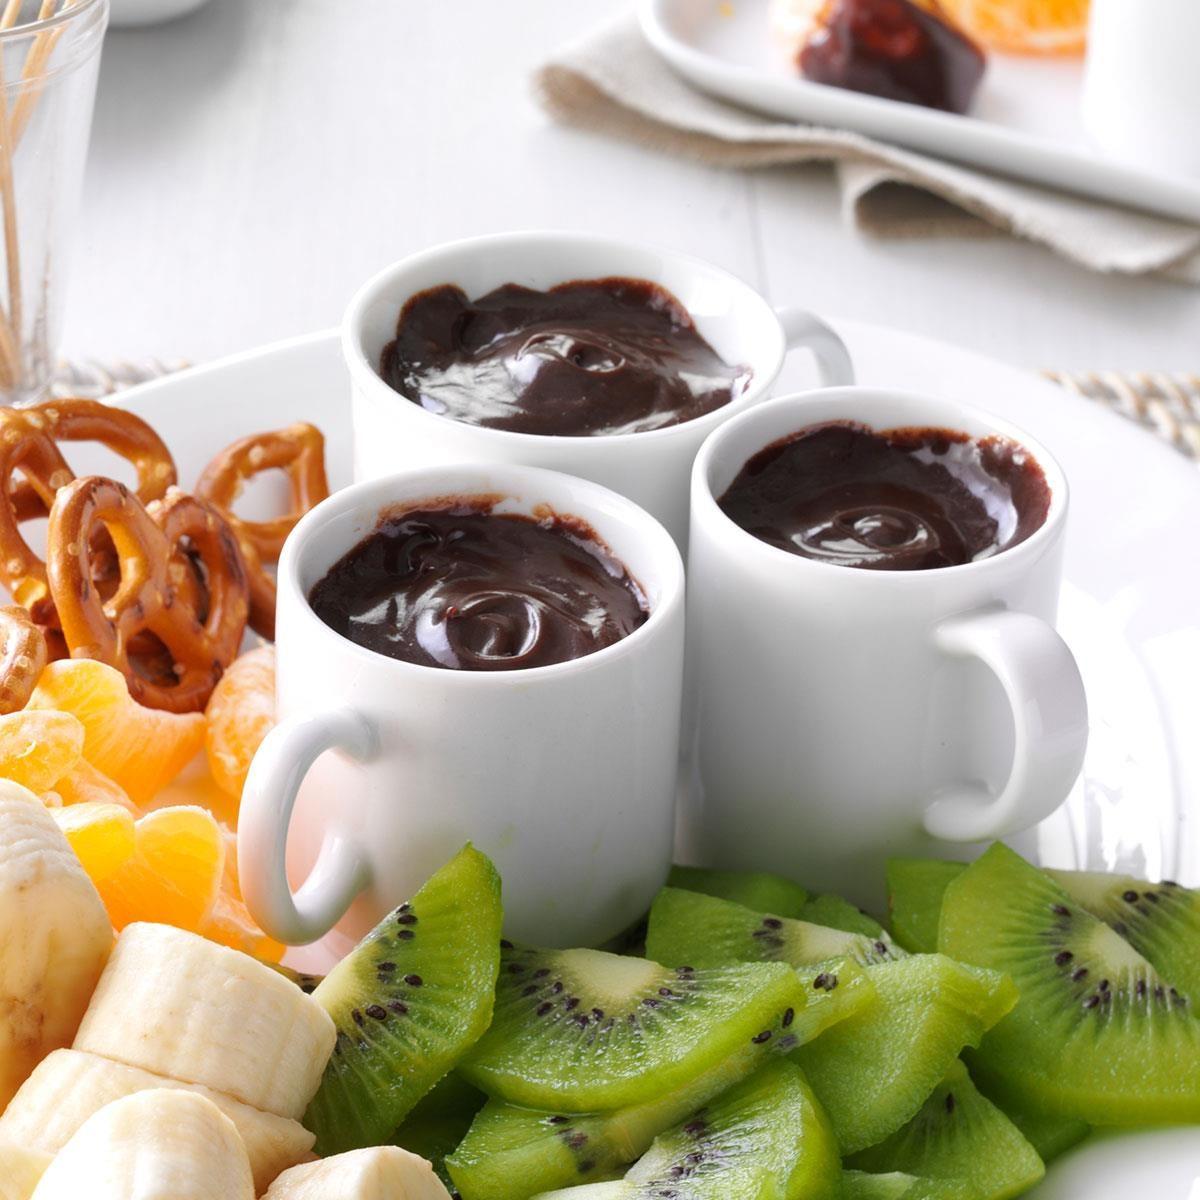 Chocolate Caramel Fondue